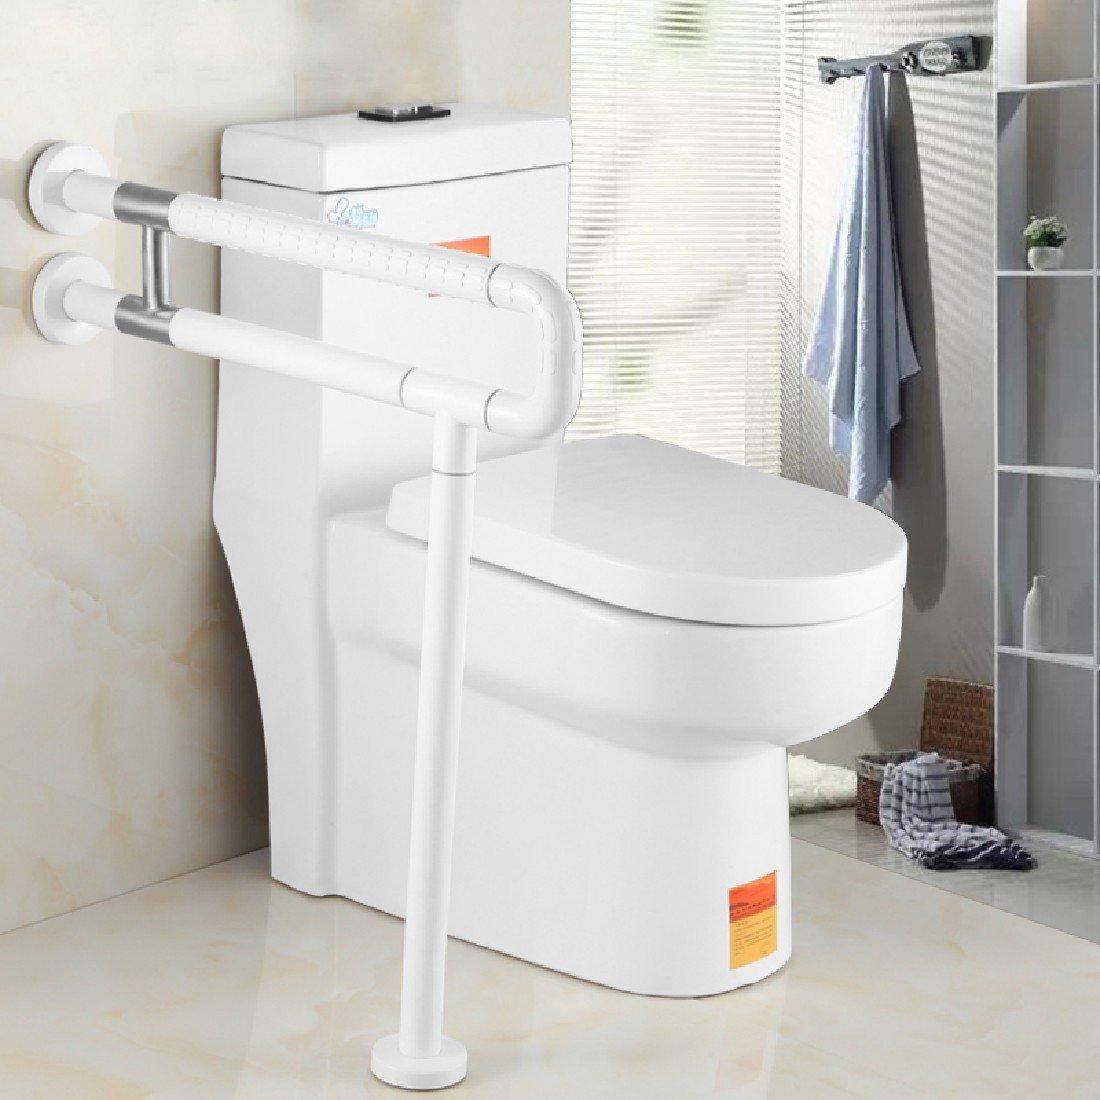 Buy BBSLT Basin handrail nylon leg safety handrail toilet toilet ...